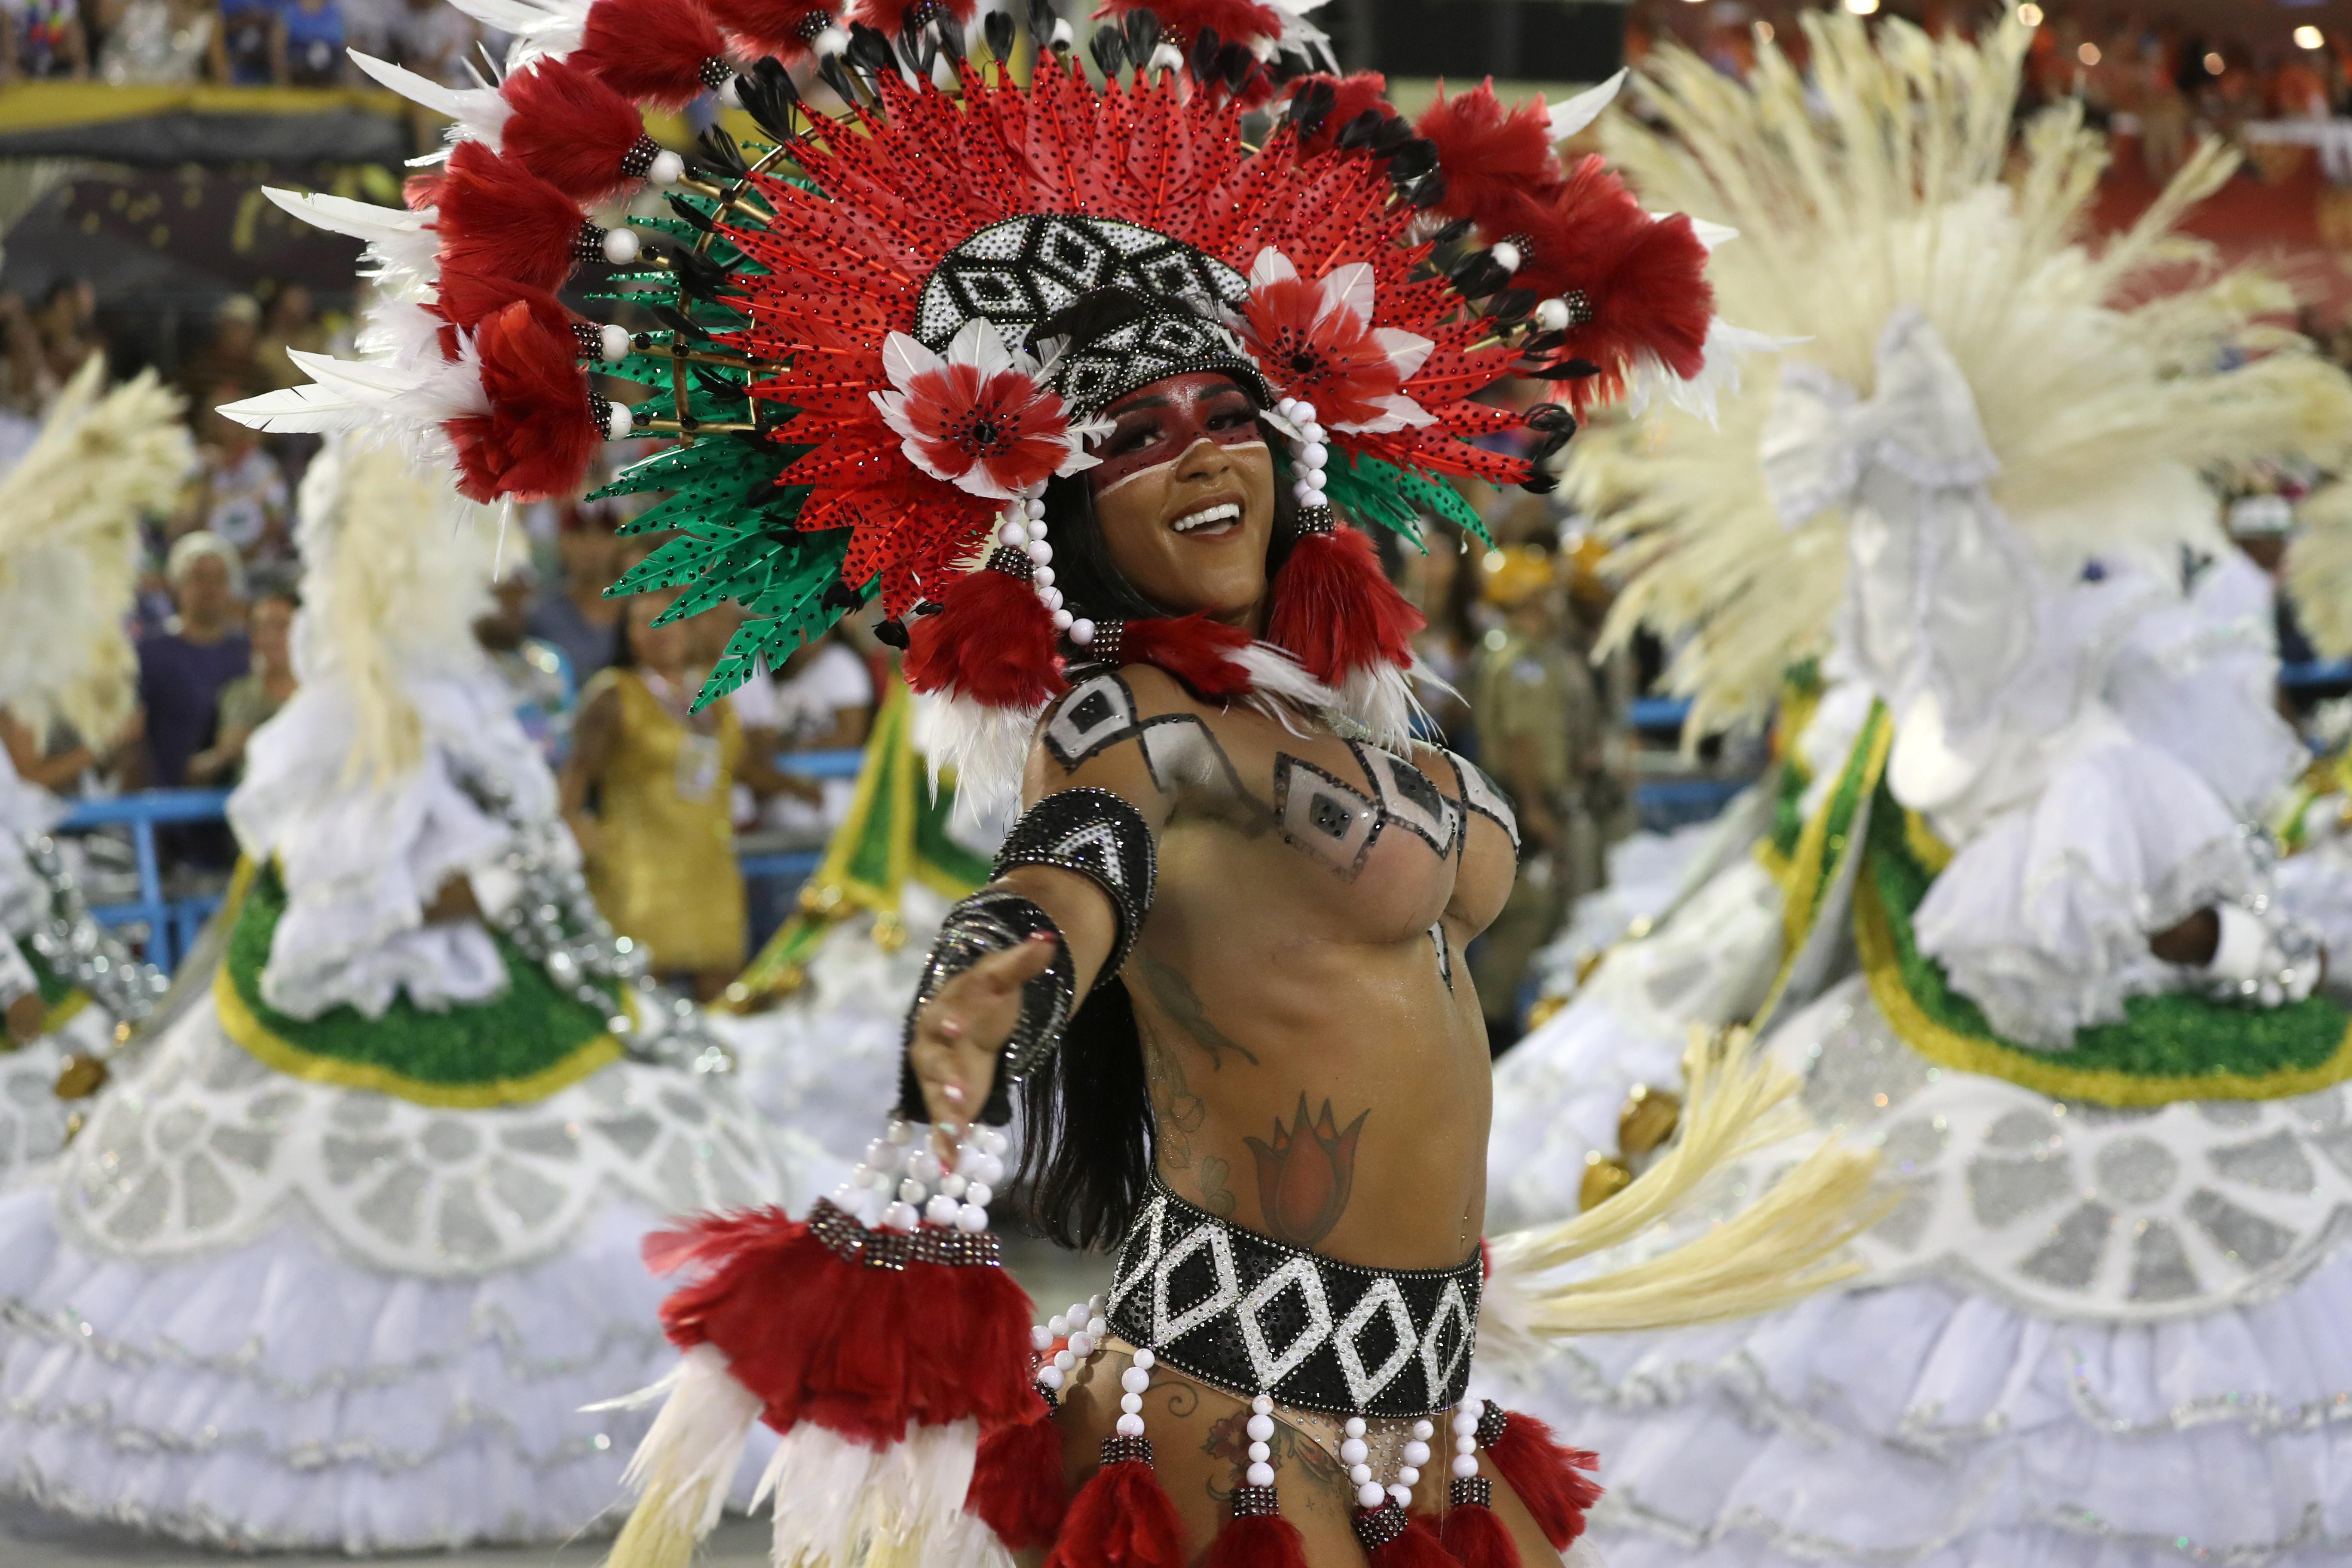 Escuela Mocidade de samba REUTERS/Sergio Moraes